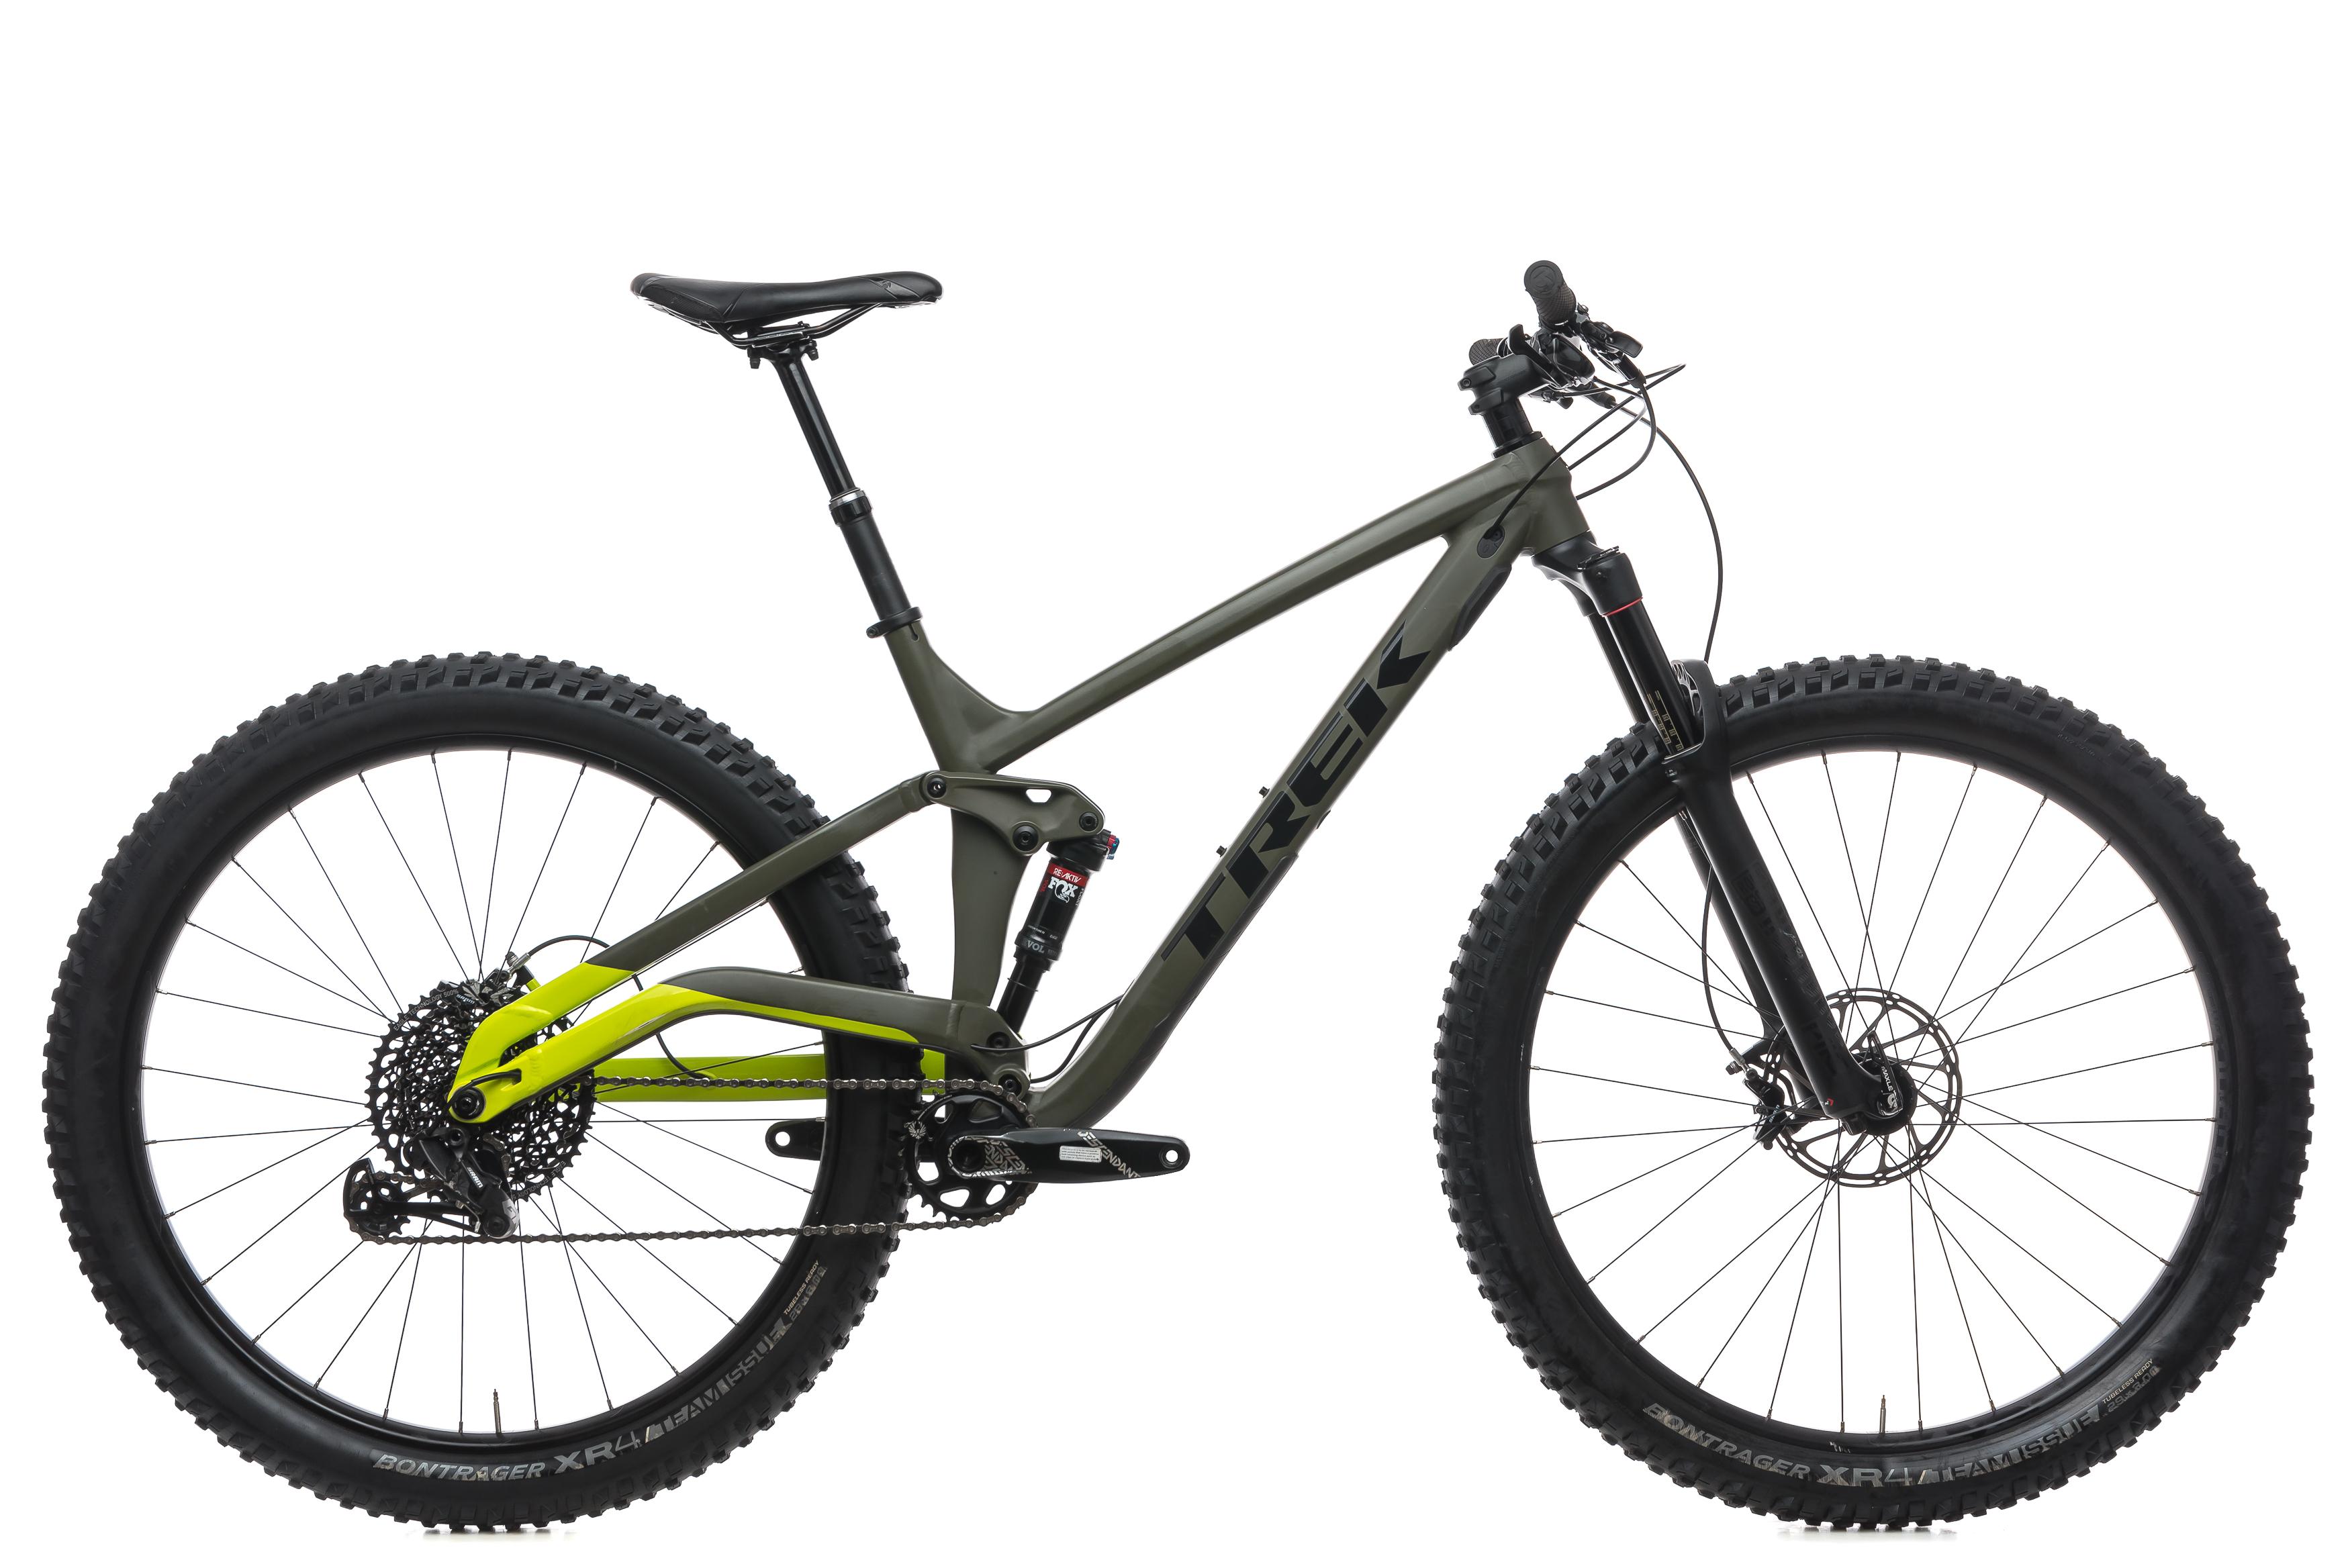 226a7a910f3 2019 Trek Full Stache 8 Mountain Bike 19.5